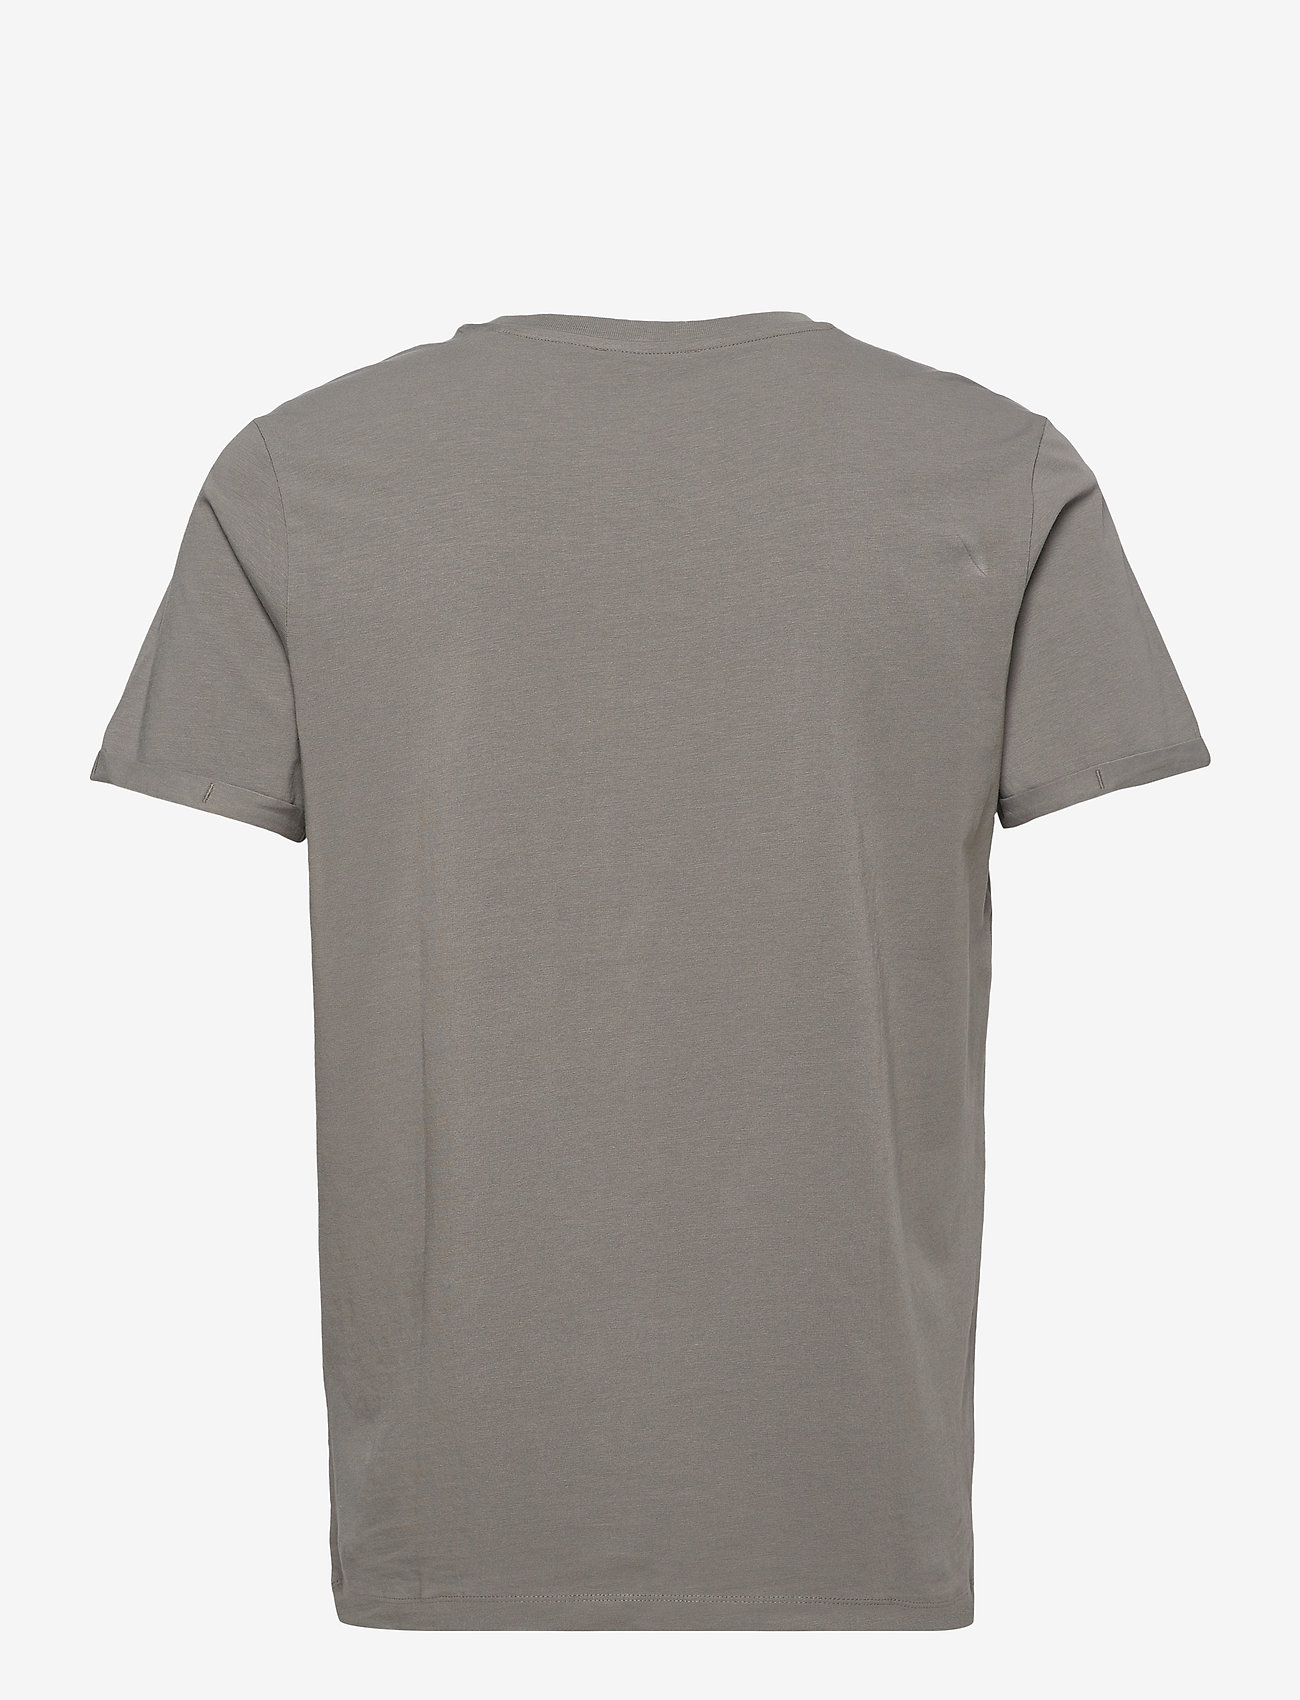 Jack & Jones - JPRBLALOGO SPRING TEE SS CREW NECK - basic t-shirts - new sage - 1